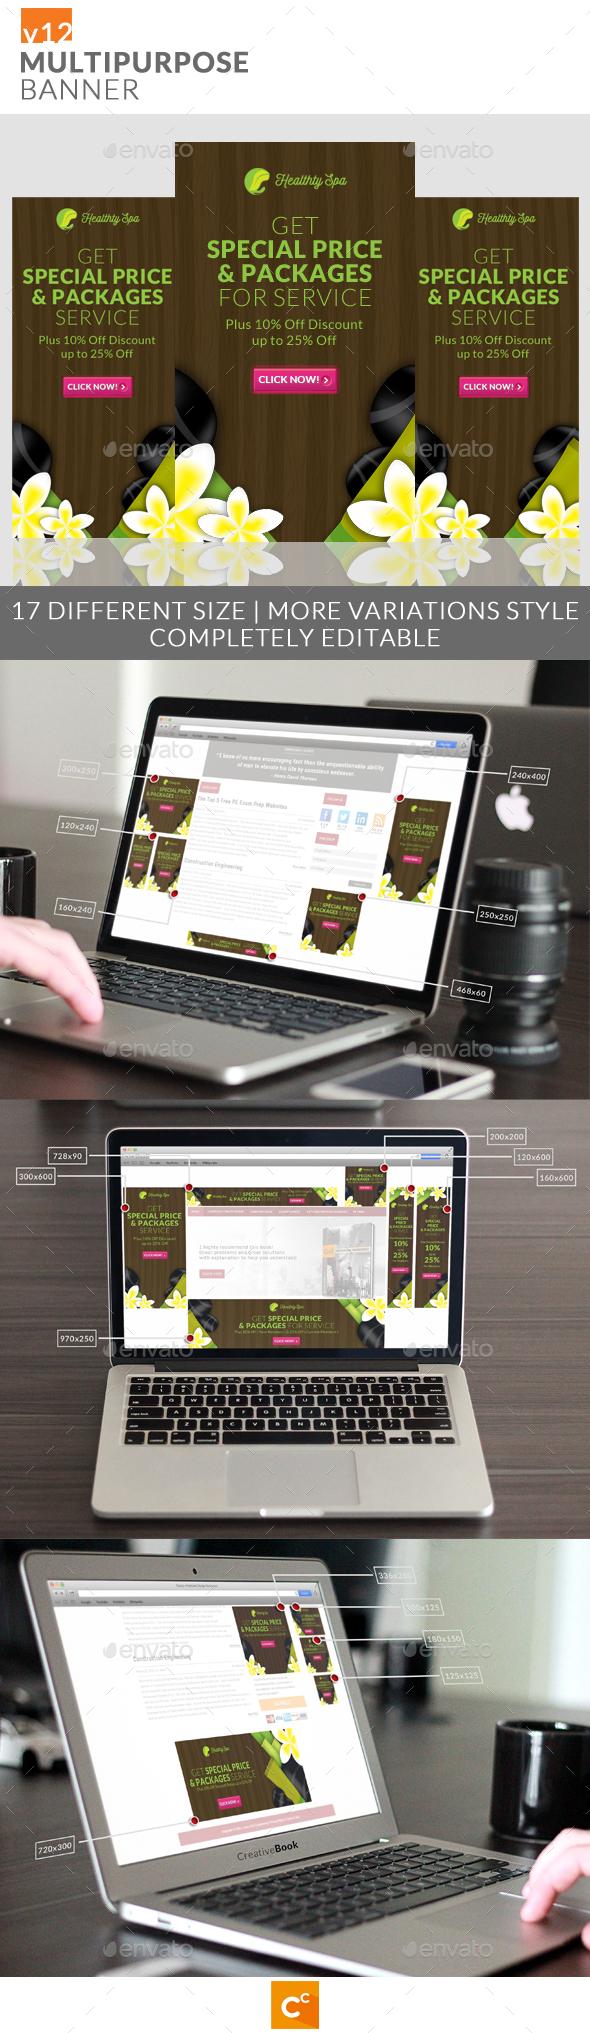 Multipurpose Banner Ads v12 - Banners & Ads Web Elements